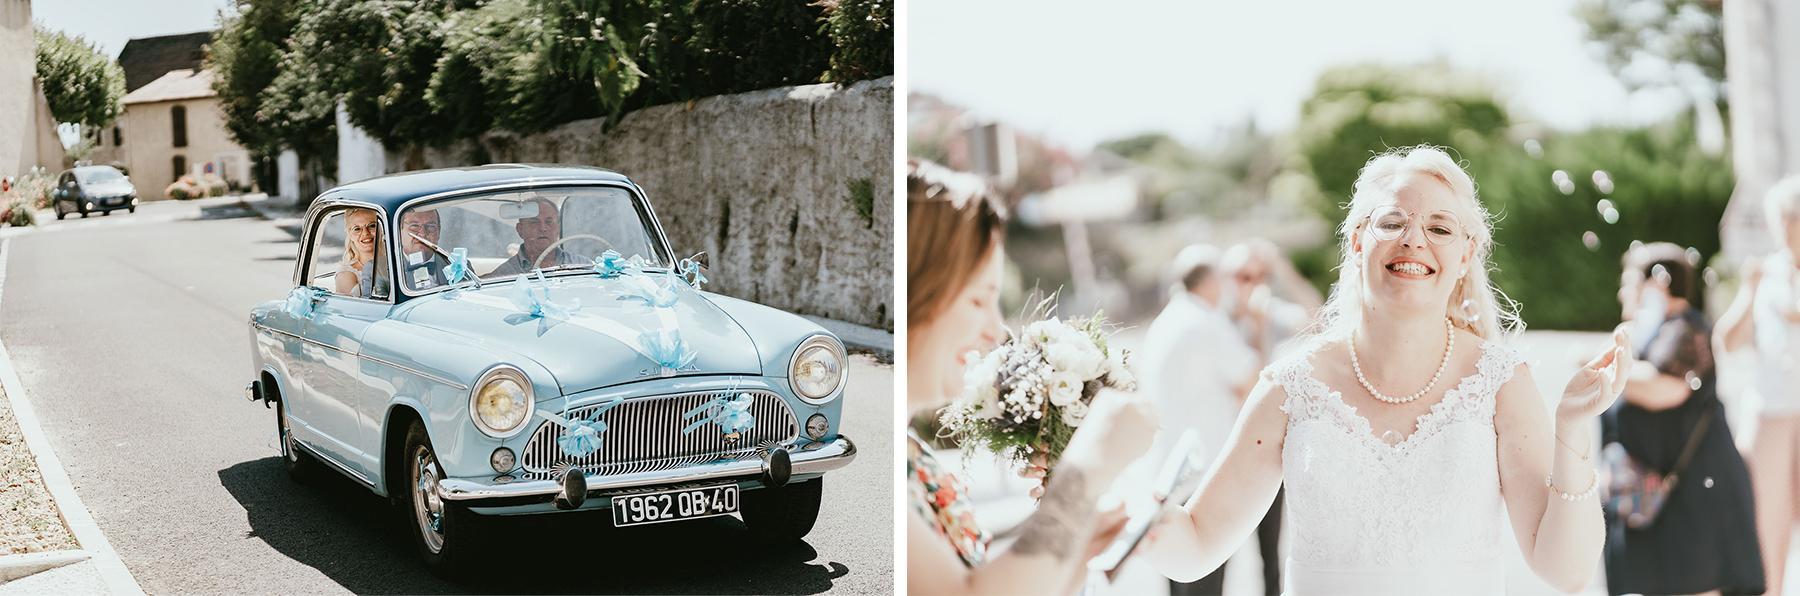 Photographe de mariage moody boho chic boheme dax landes aquitaine fineart 12tr 1